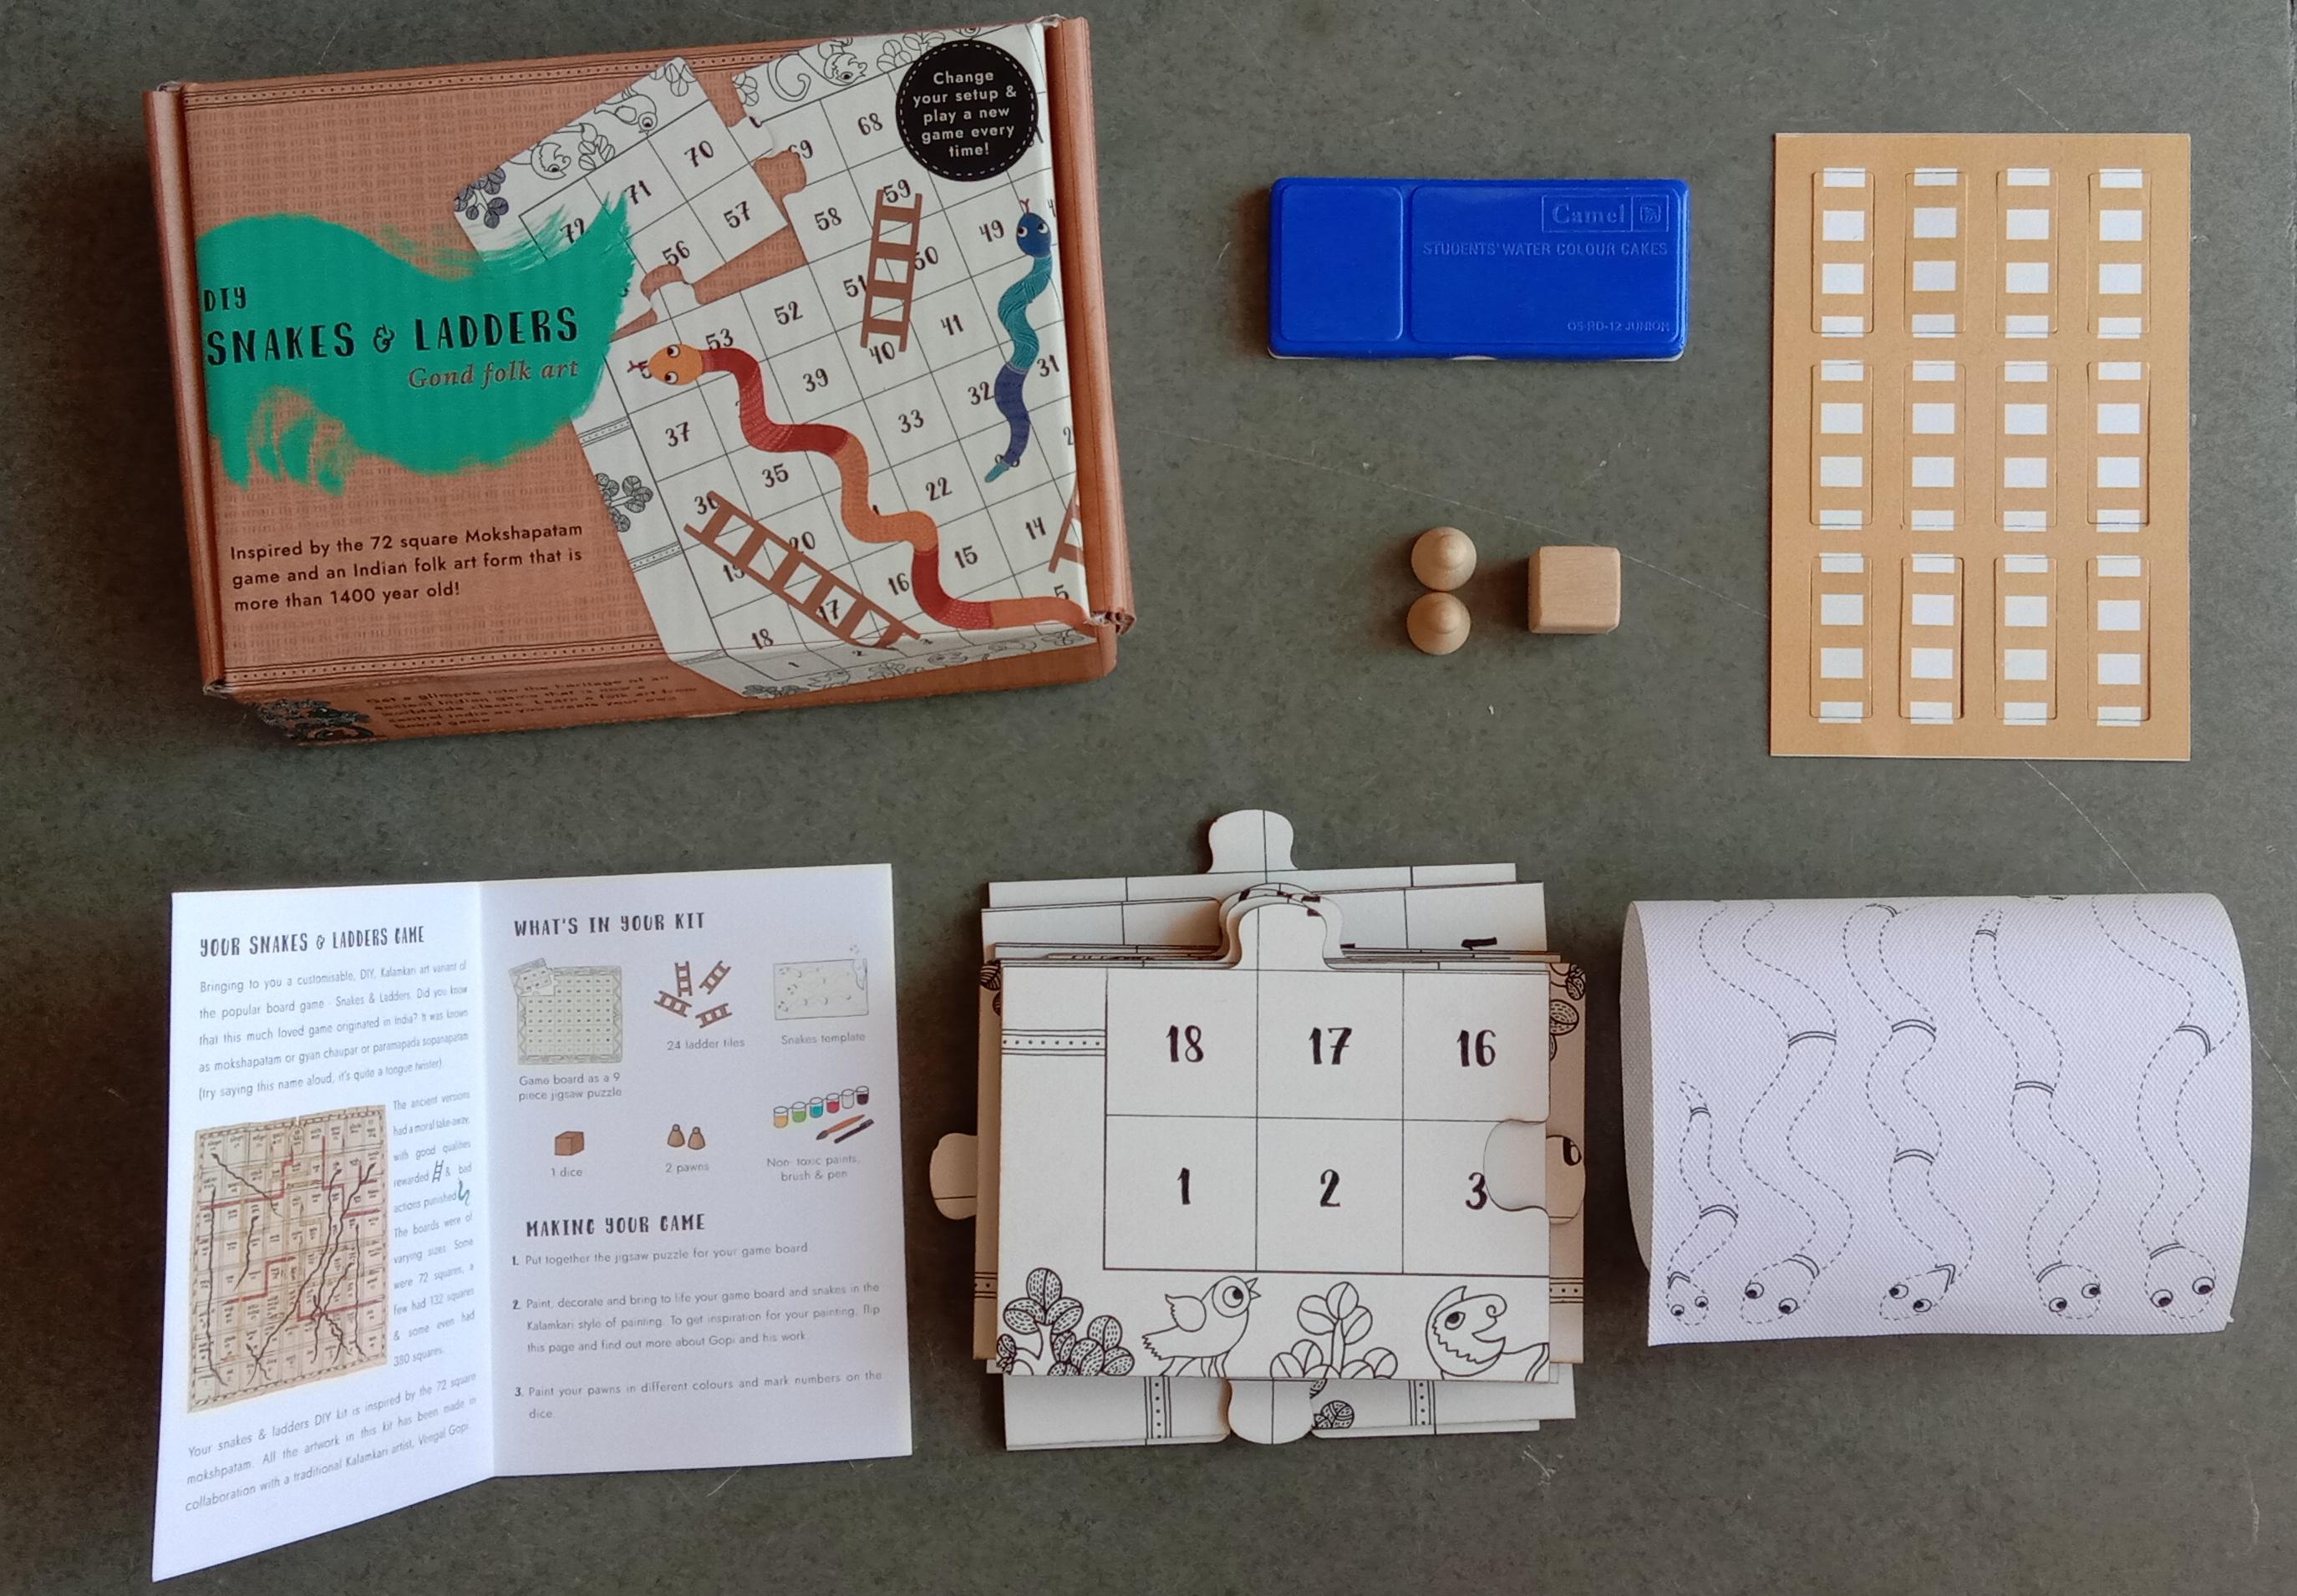 DIY Snakes & Ladders Jigsaw puzzle kit: Gond art